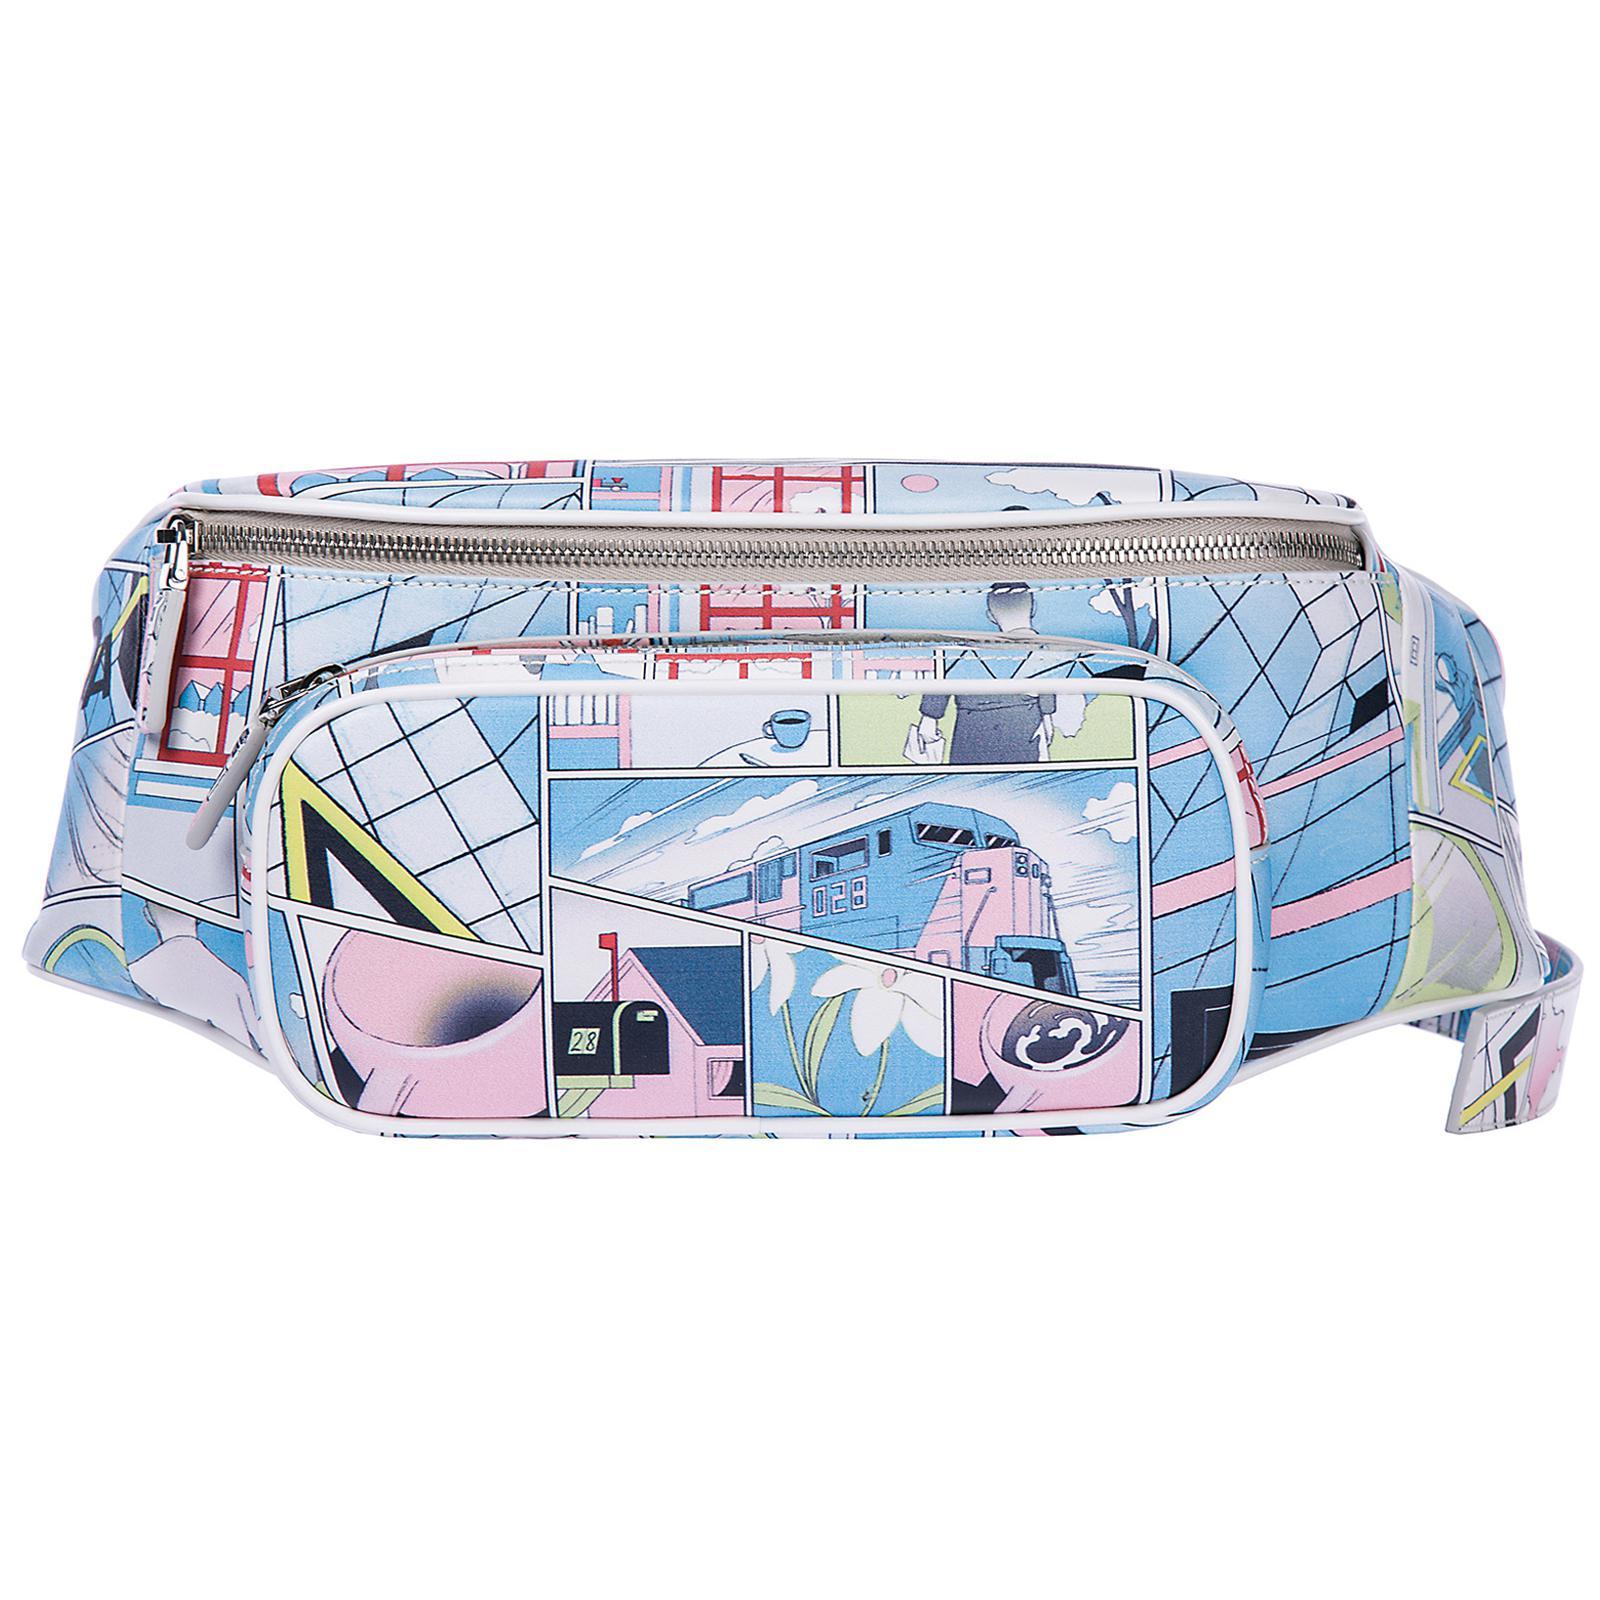 58159e7f927943 Lyst - Prada Leather Belt Bum Bag Hip Pouch Comics in Blue for Men